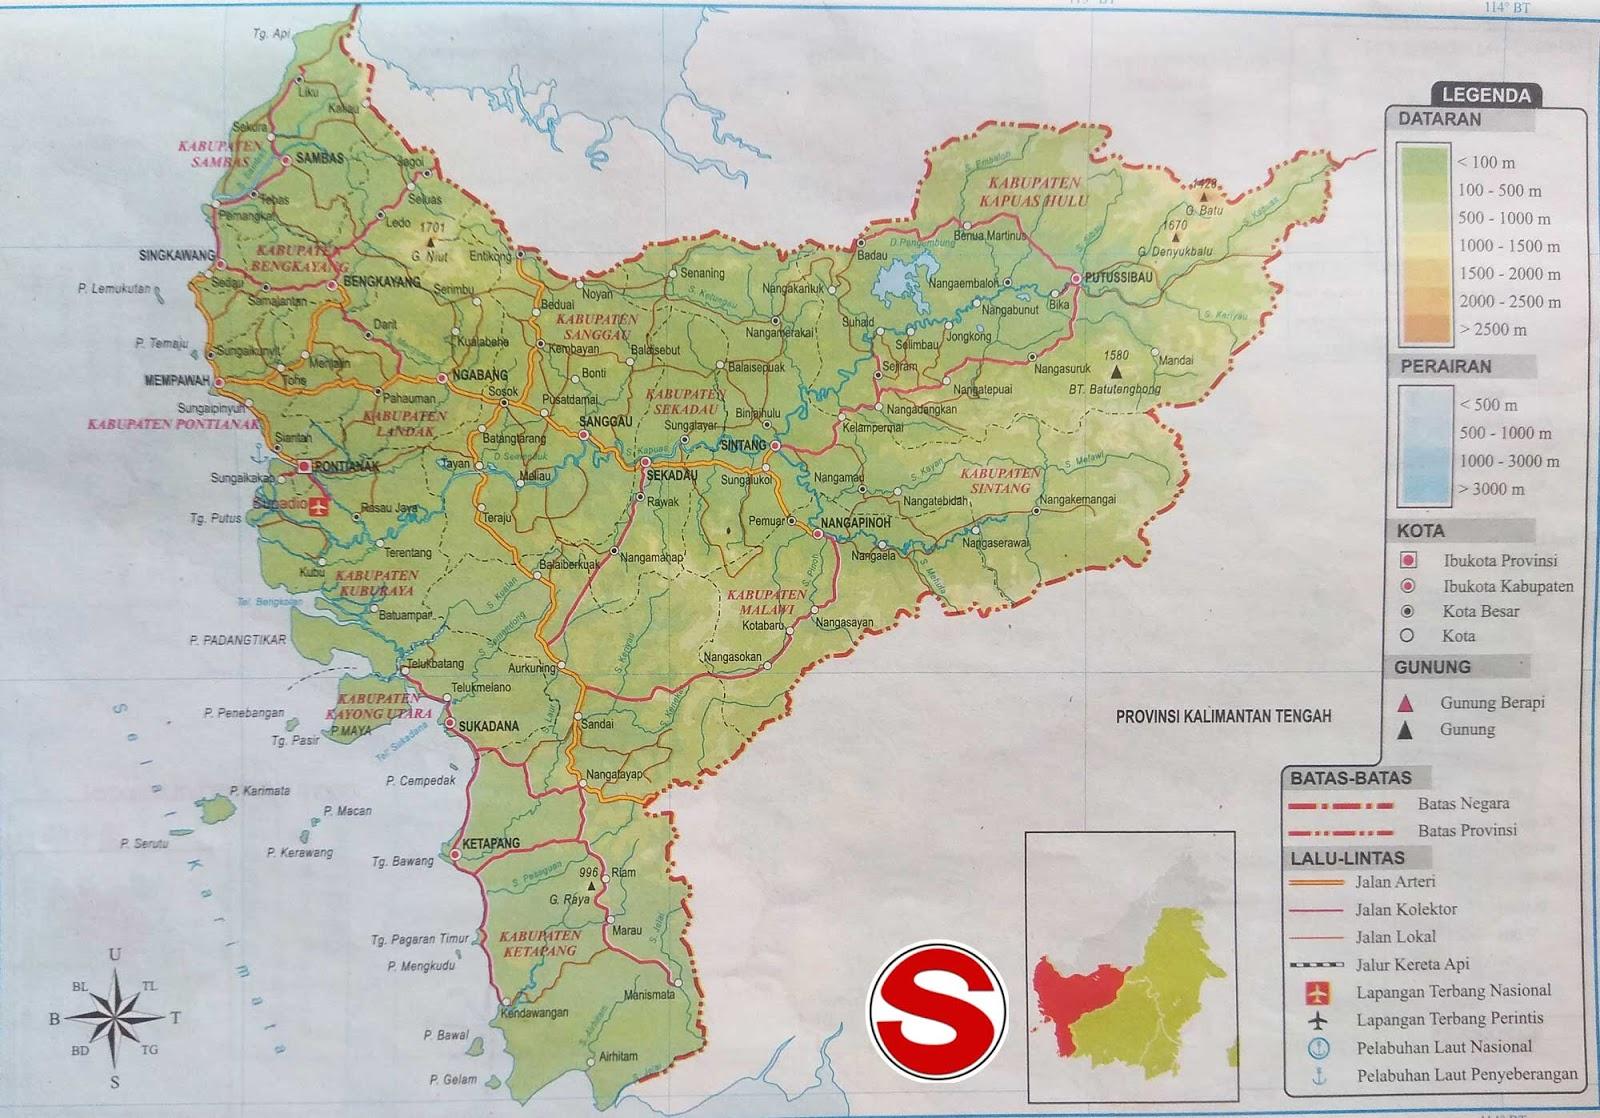 image: Peta atlas Kalimantan Barat